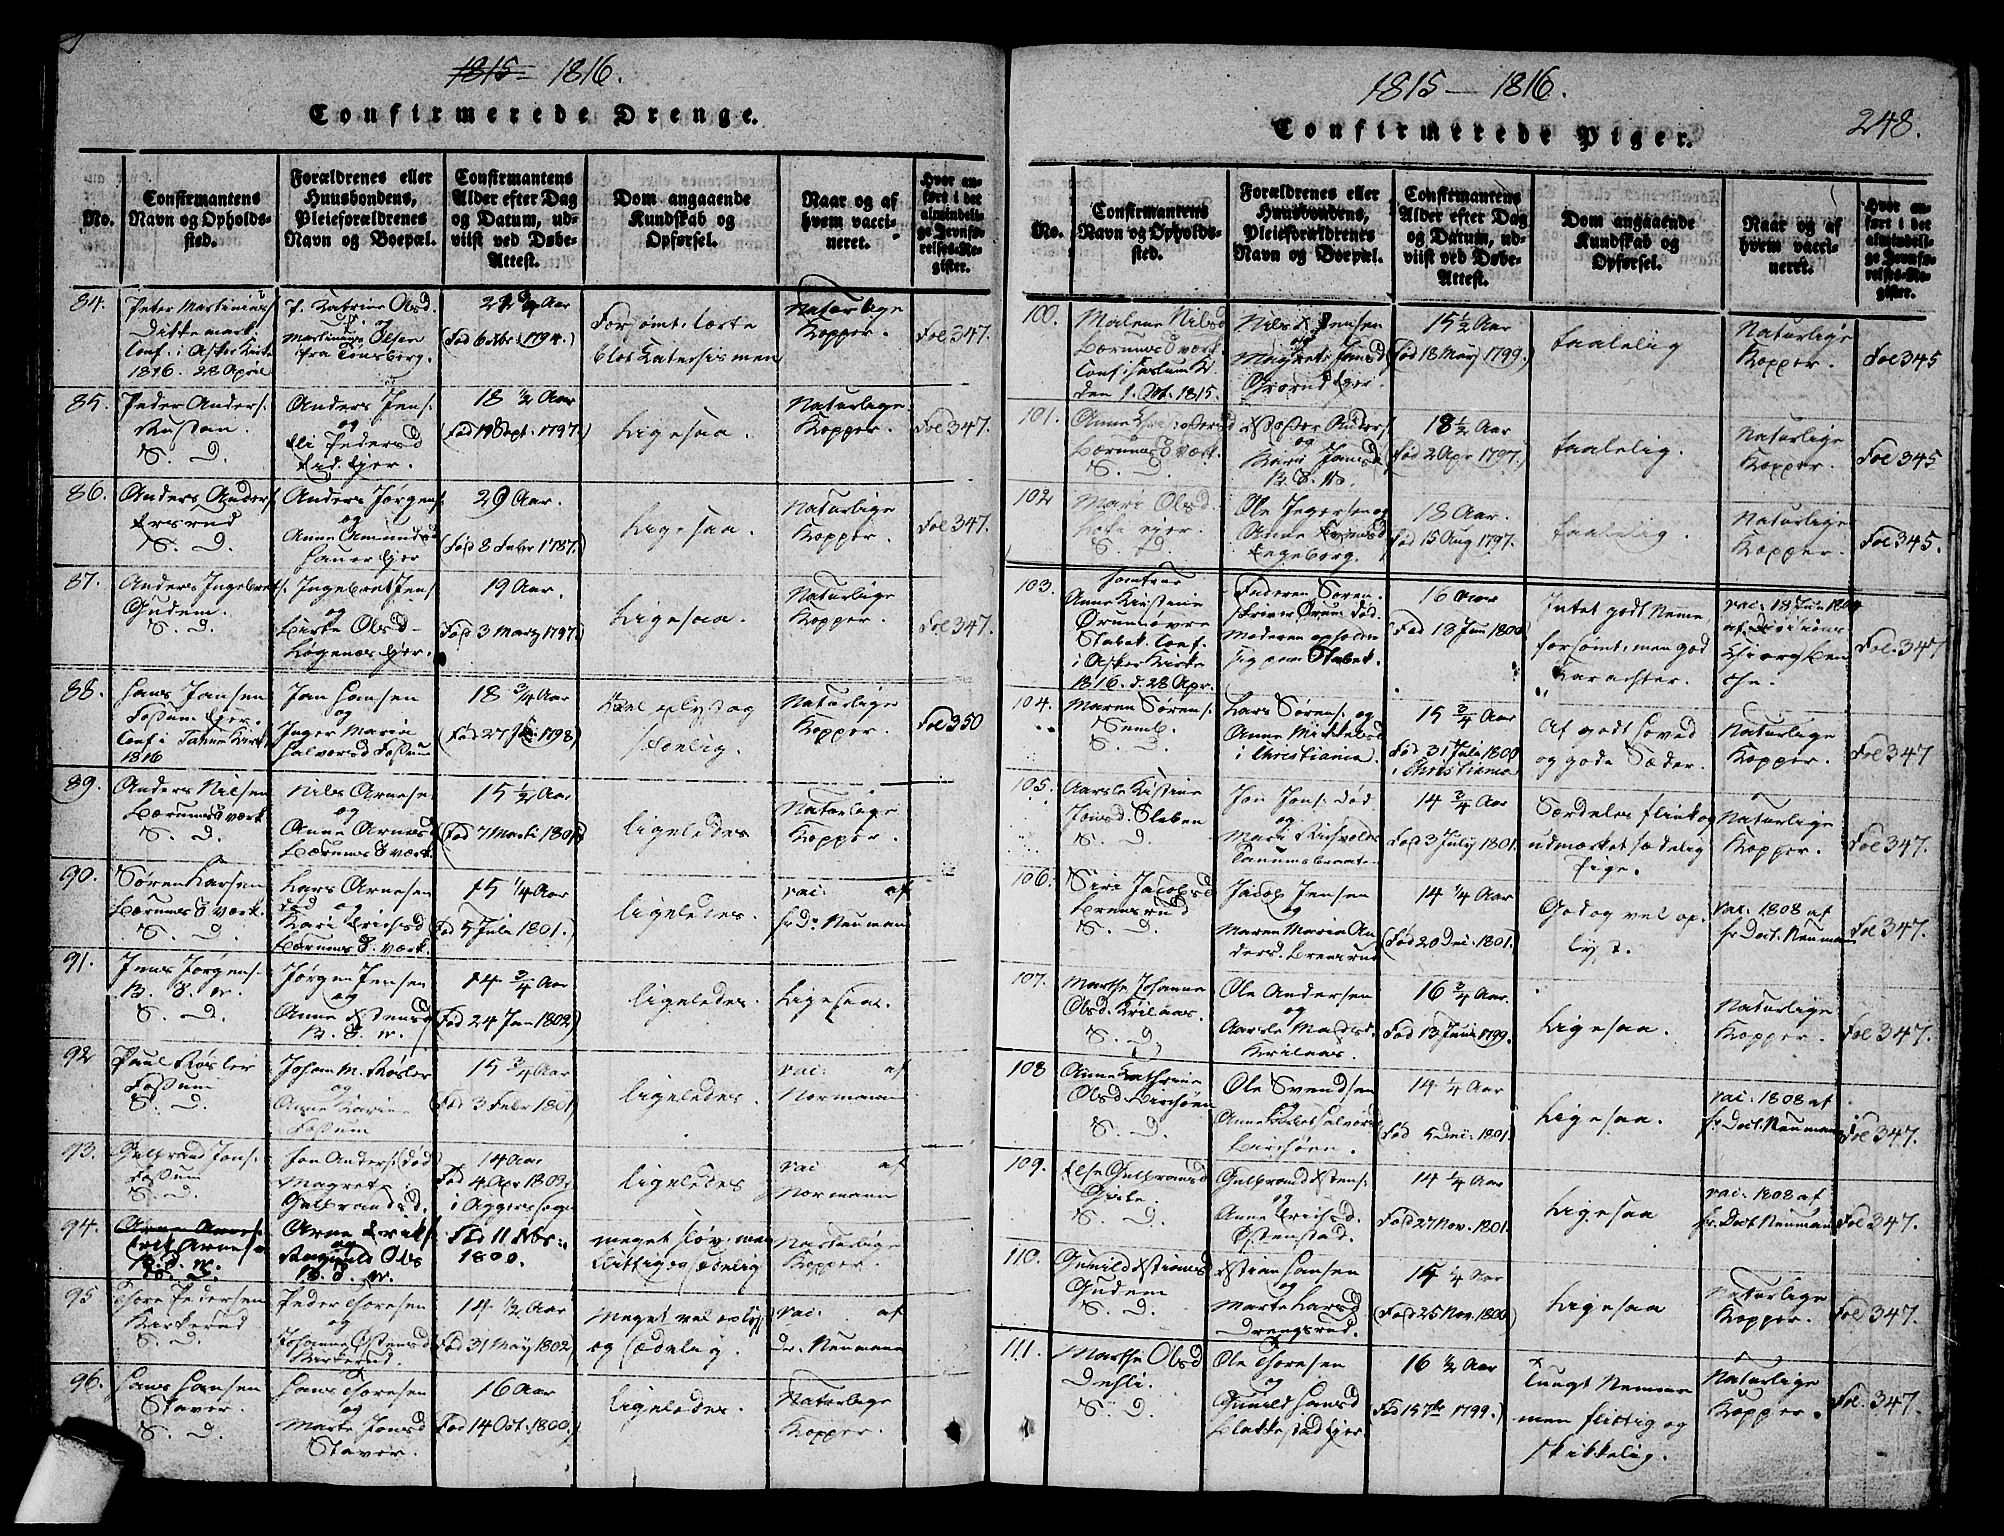 SAO, Asker prestekontor Kirkebøker, G/Ga/L0001: Klokkerbok nr. I 1, 1814-1830, s. 248